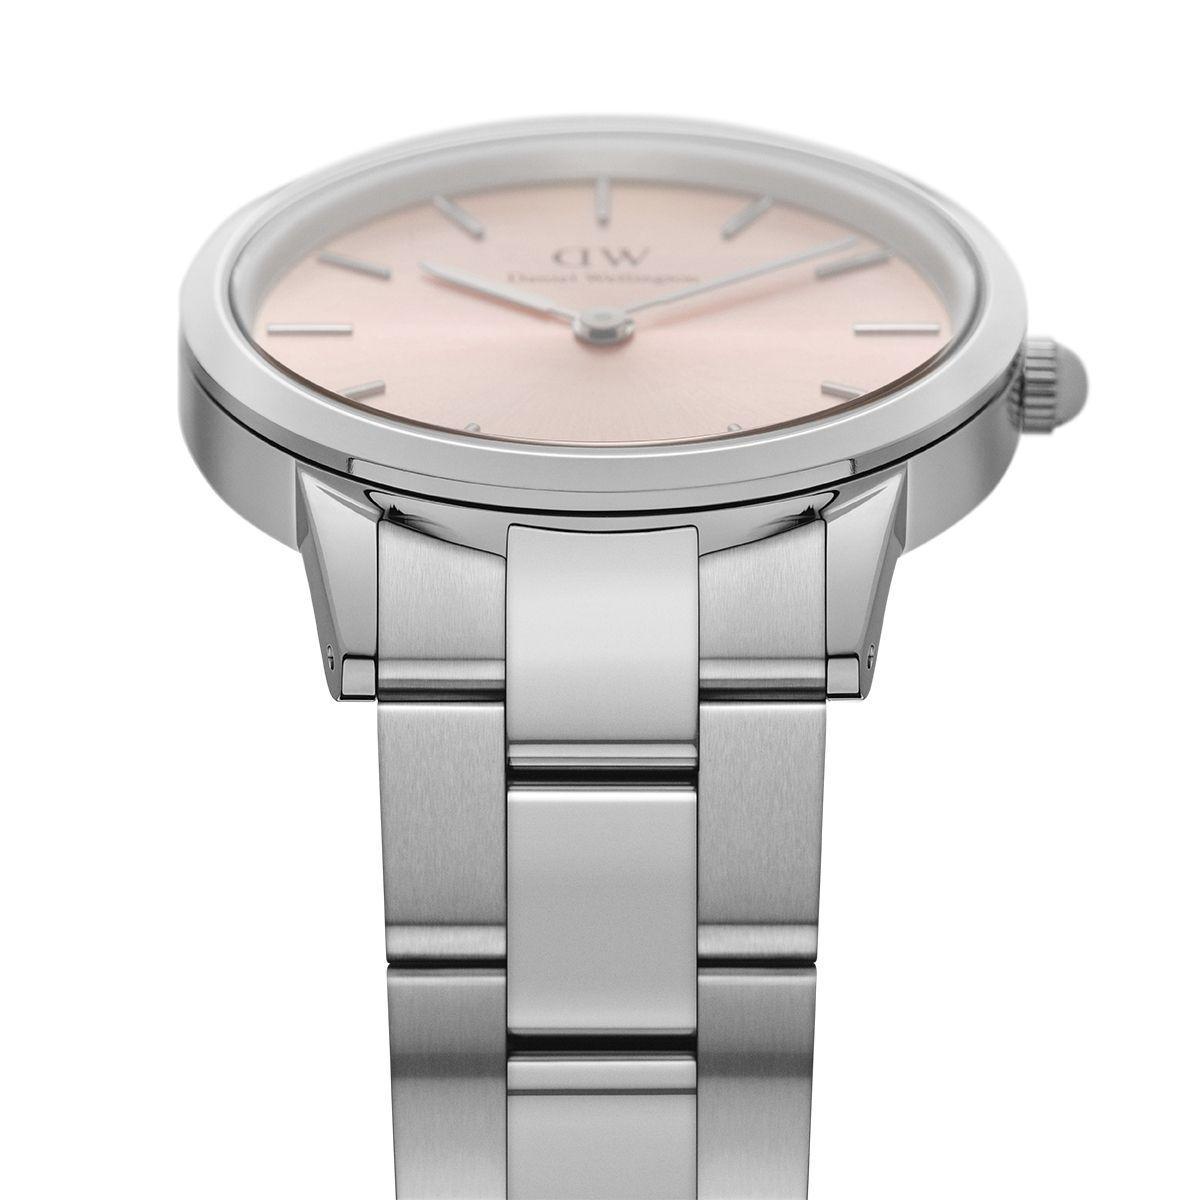 dw官网 dw手表官网 dw中国官网 dw官方旗舰店 DW DW官网  Watch Iconic Link Silver Pink 28mm